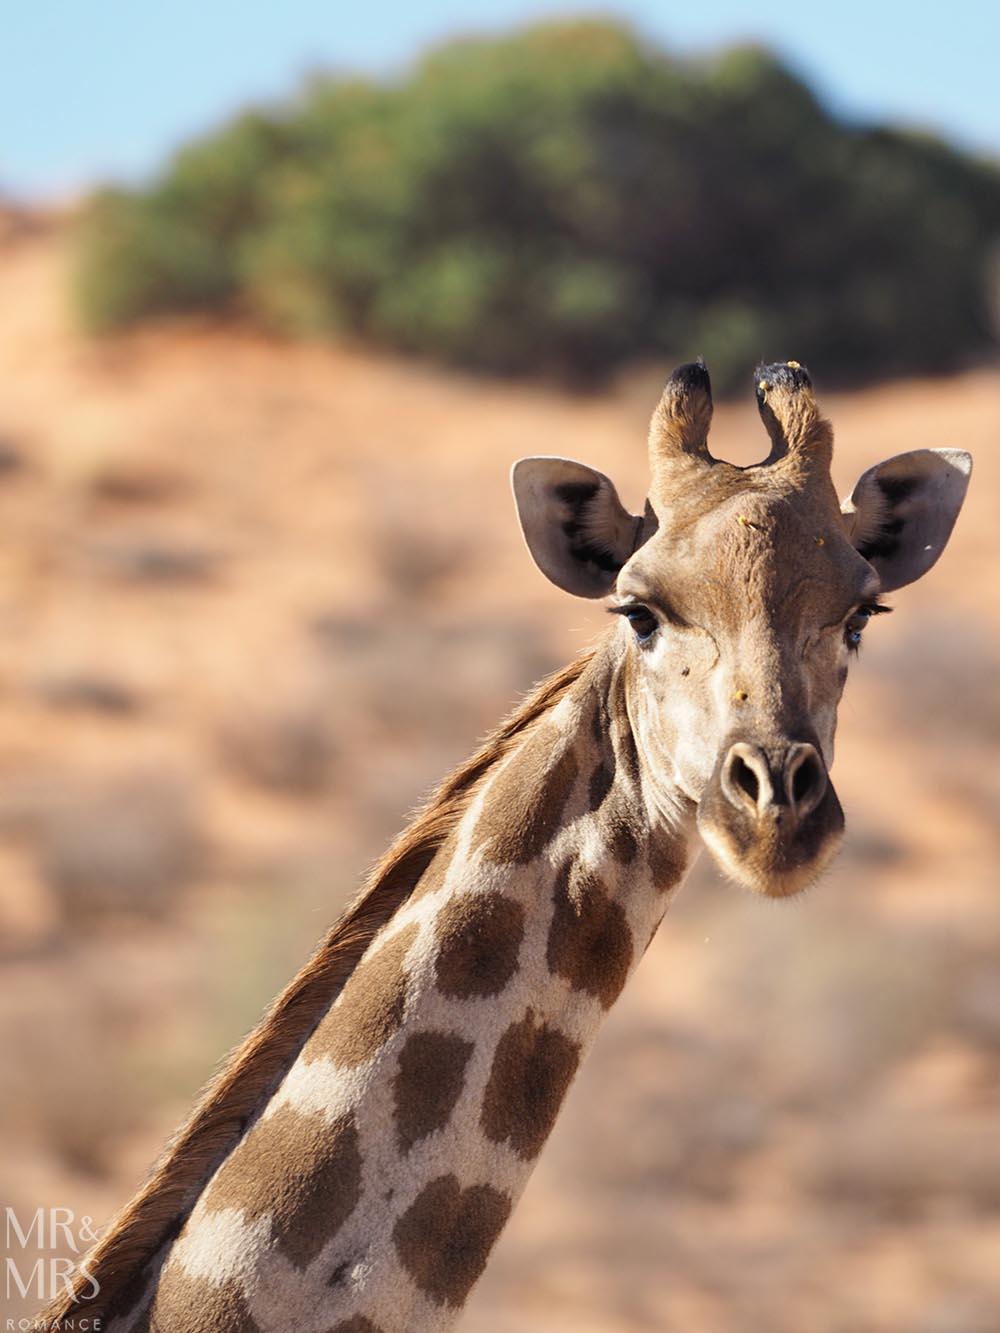 Xaus Lodge Kgalagadi Transfrontier Park, Kalahari Desert safari, South Africa - giraffe